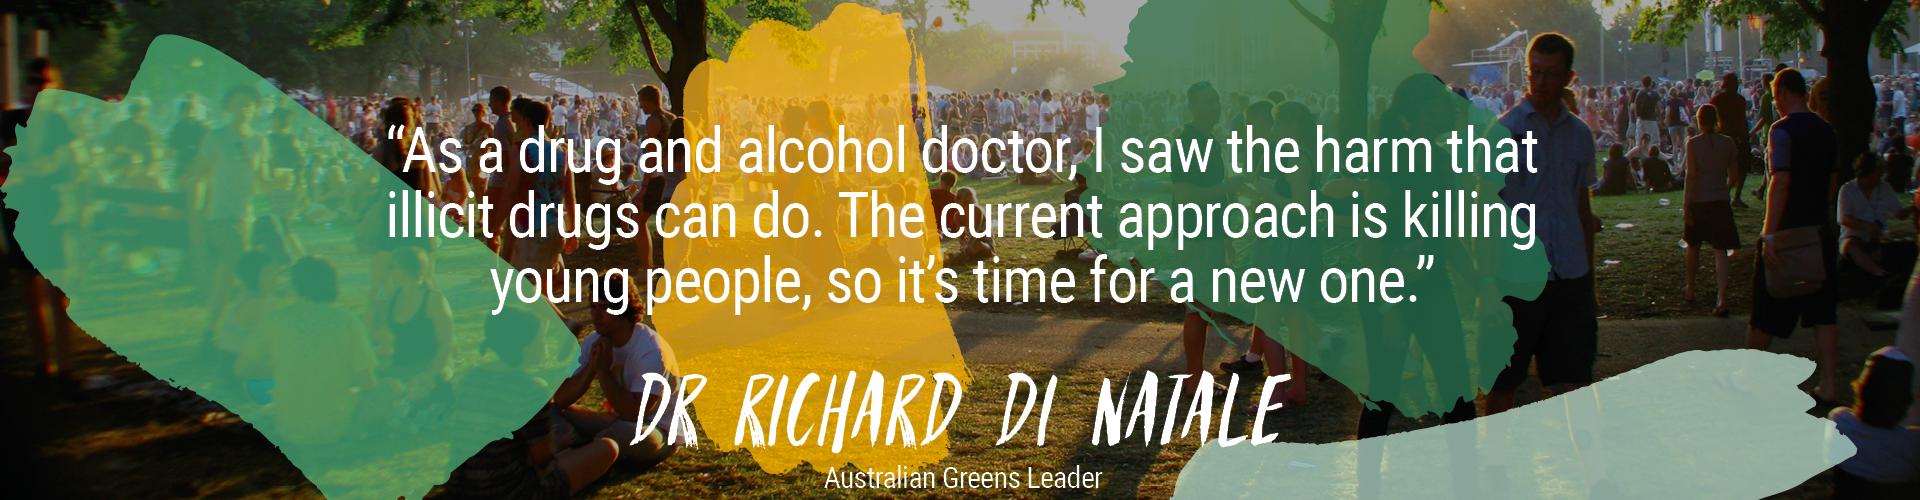 Dr Richard Di Natale